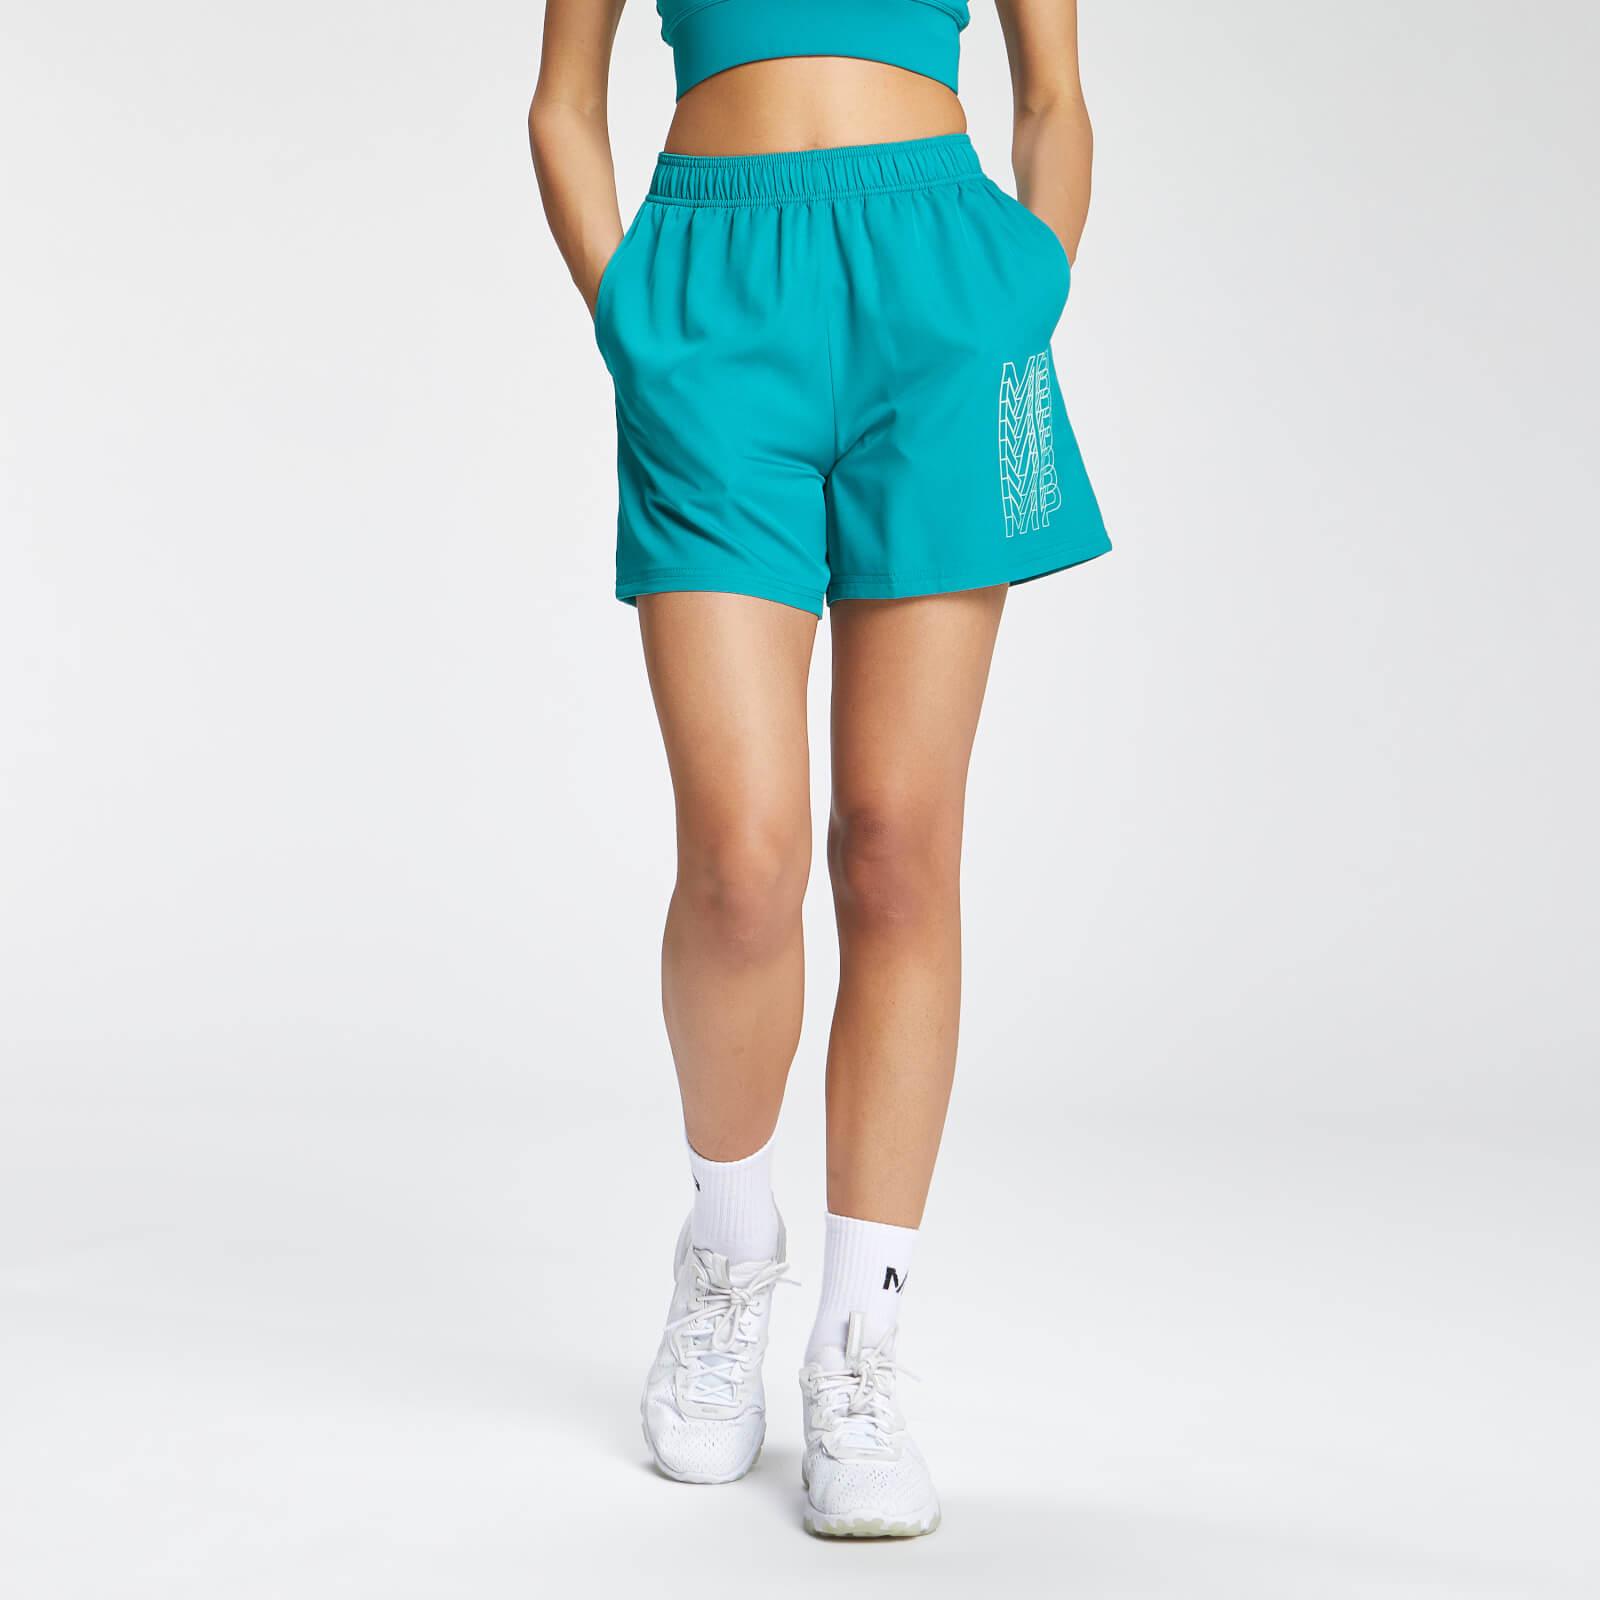 Купить MP Women's Repeat MP Training Shorts - Teal - XXS, Myprotein International